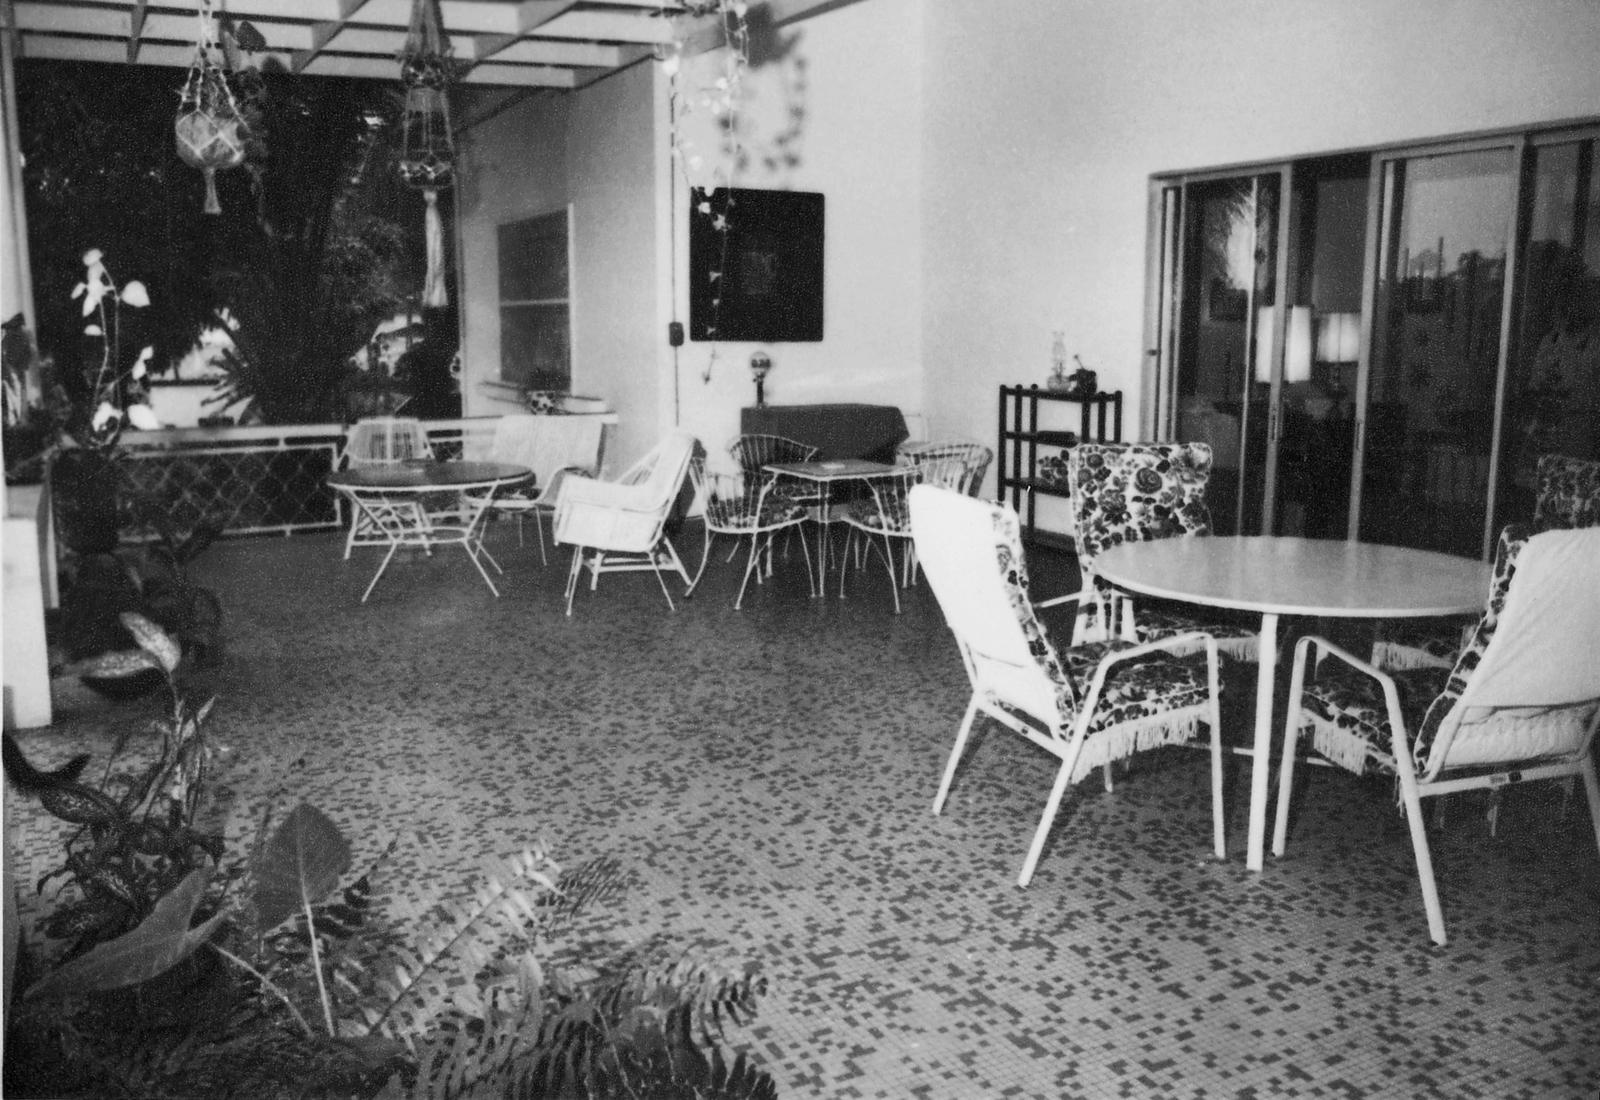 Abidjan - Recreation/Community Center/Gym/Theater - 1962